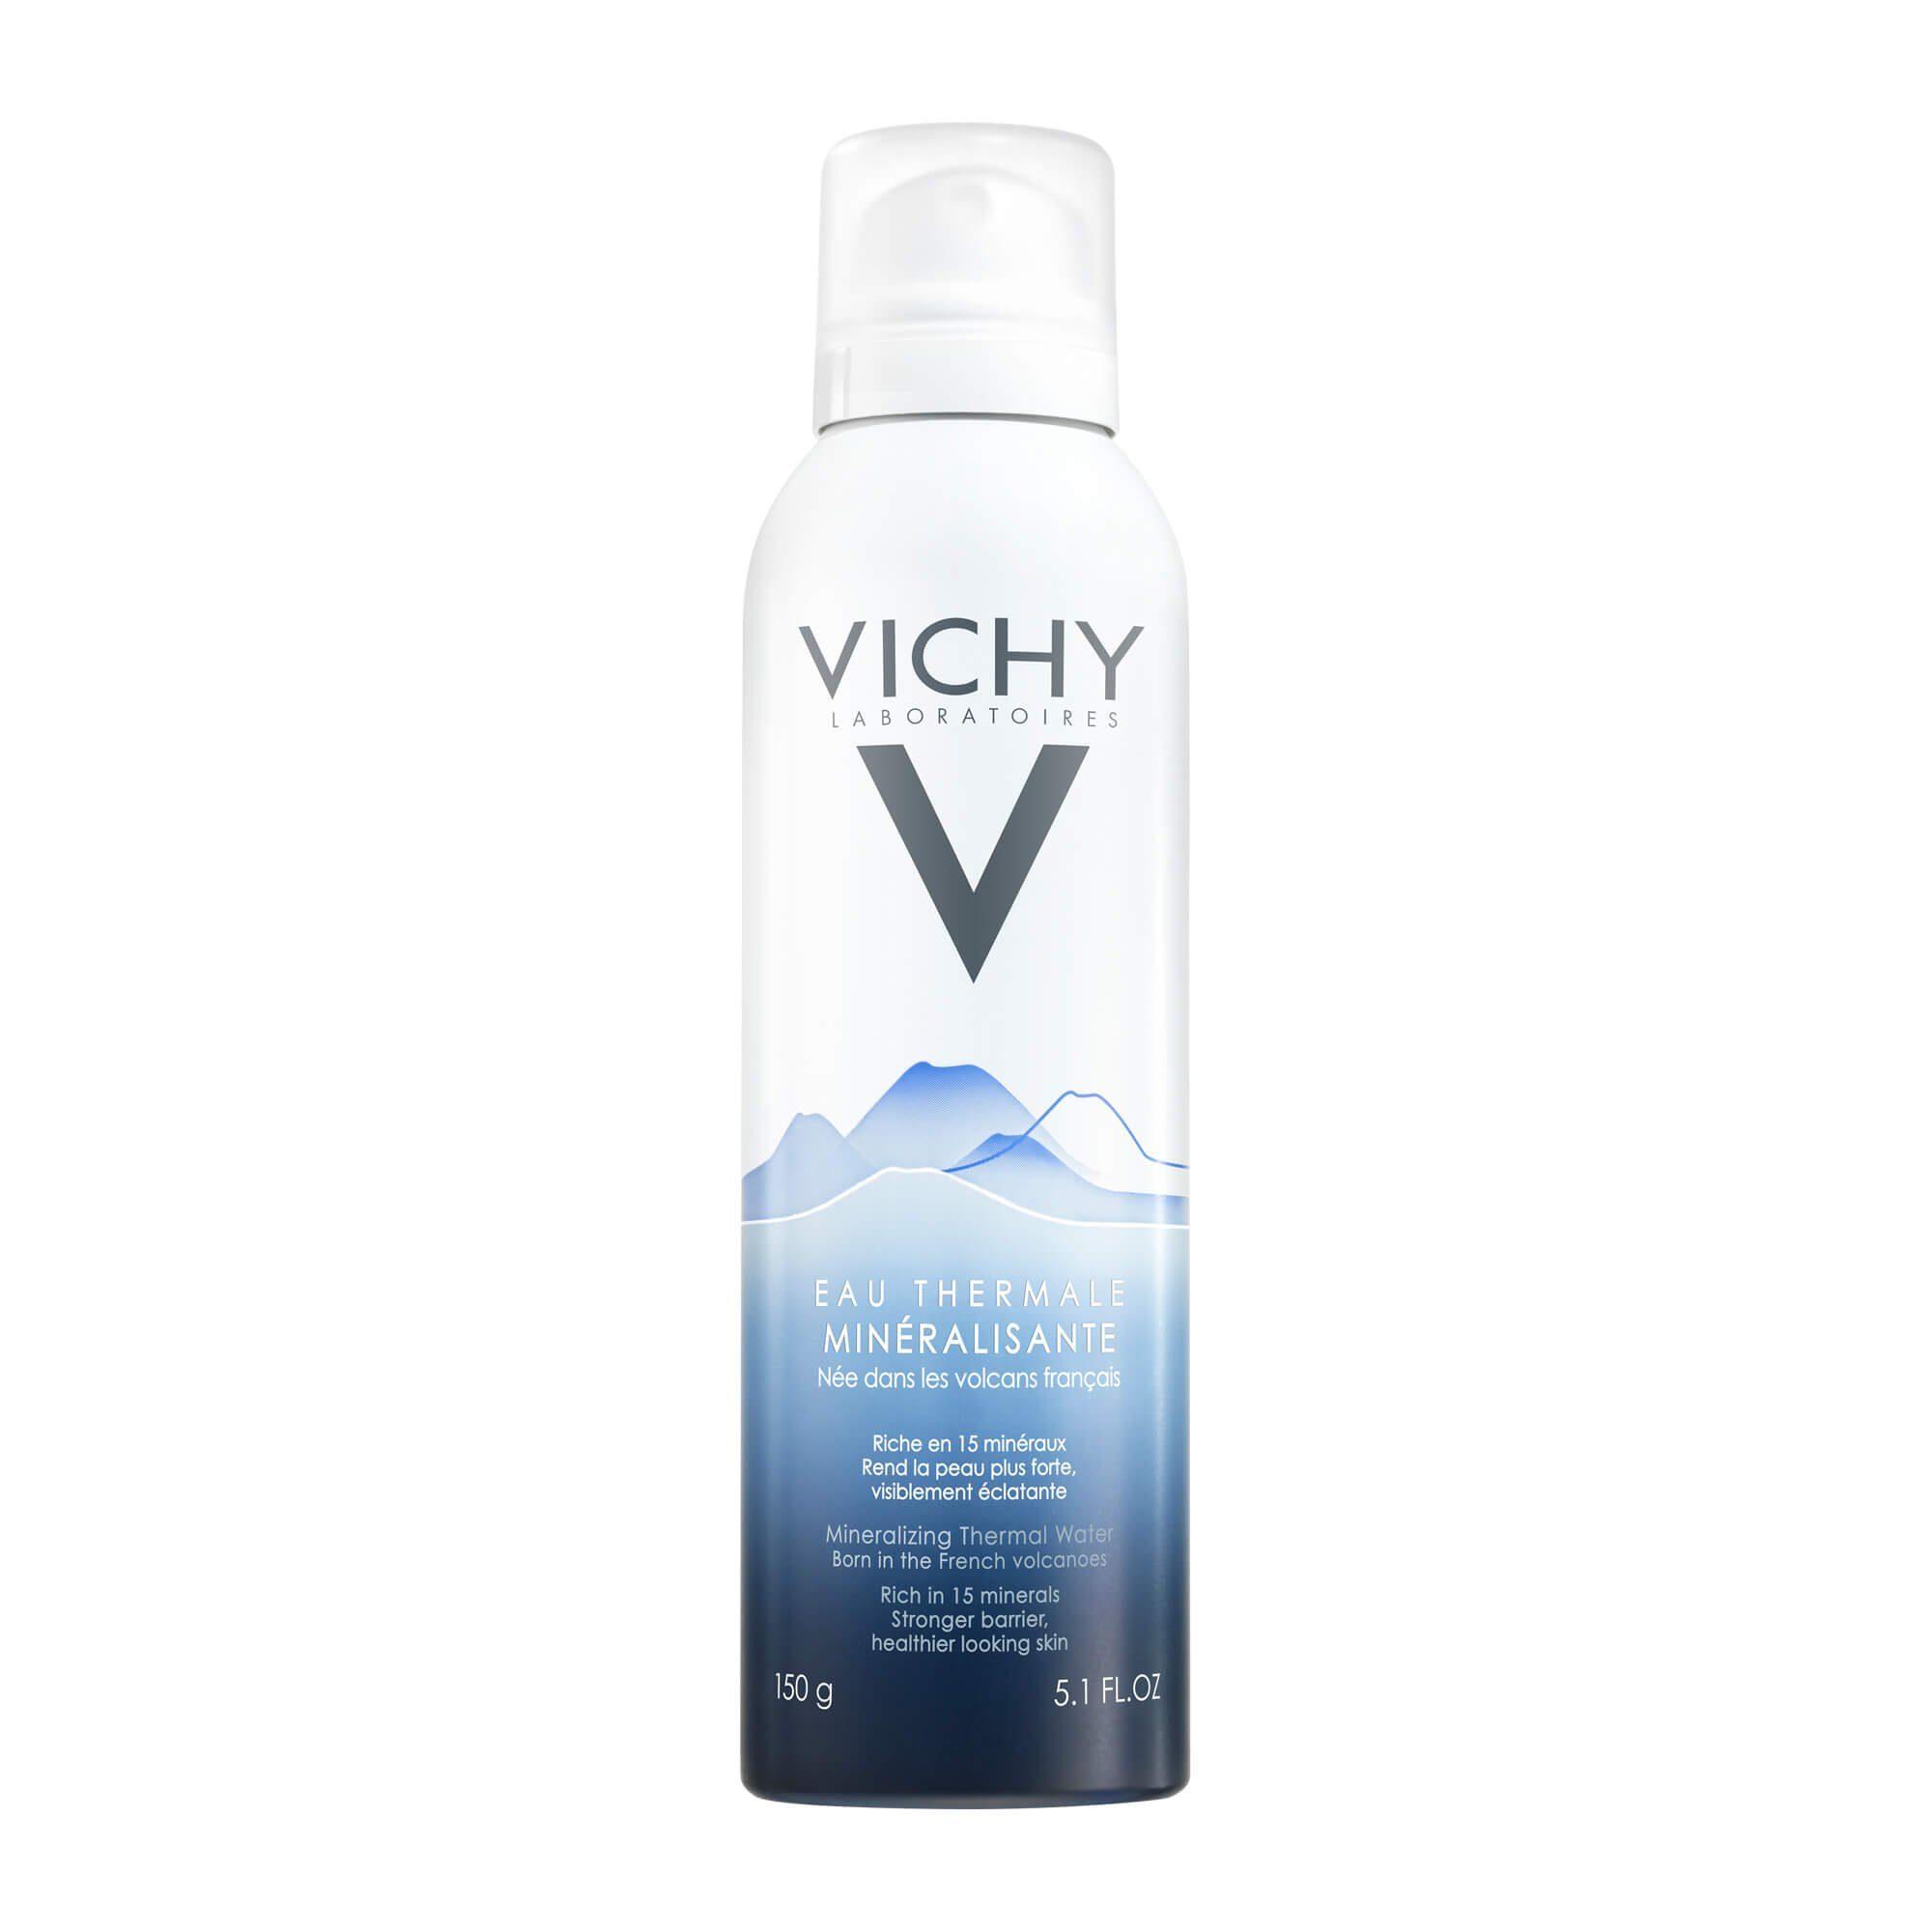 Vichy Thermal Water Spray